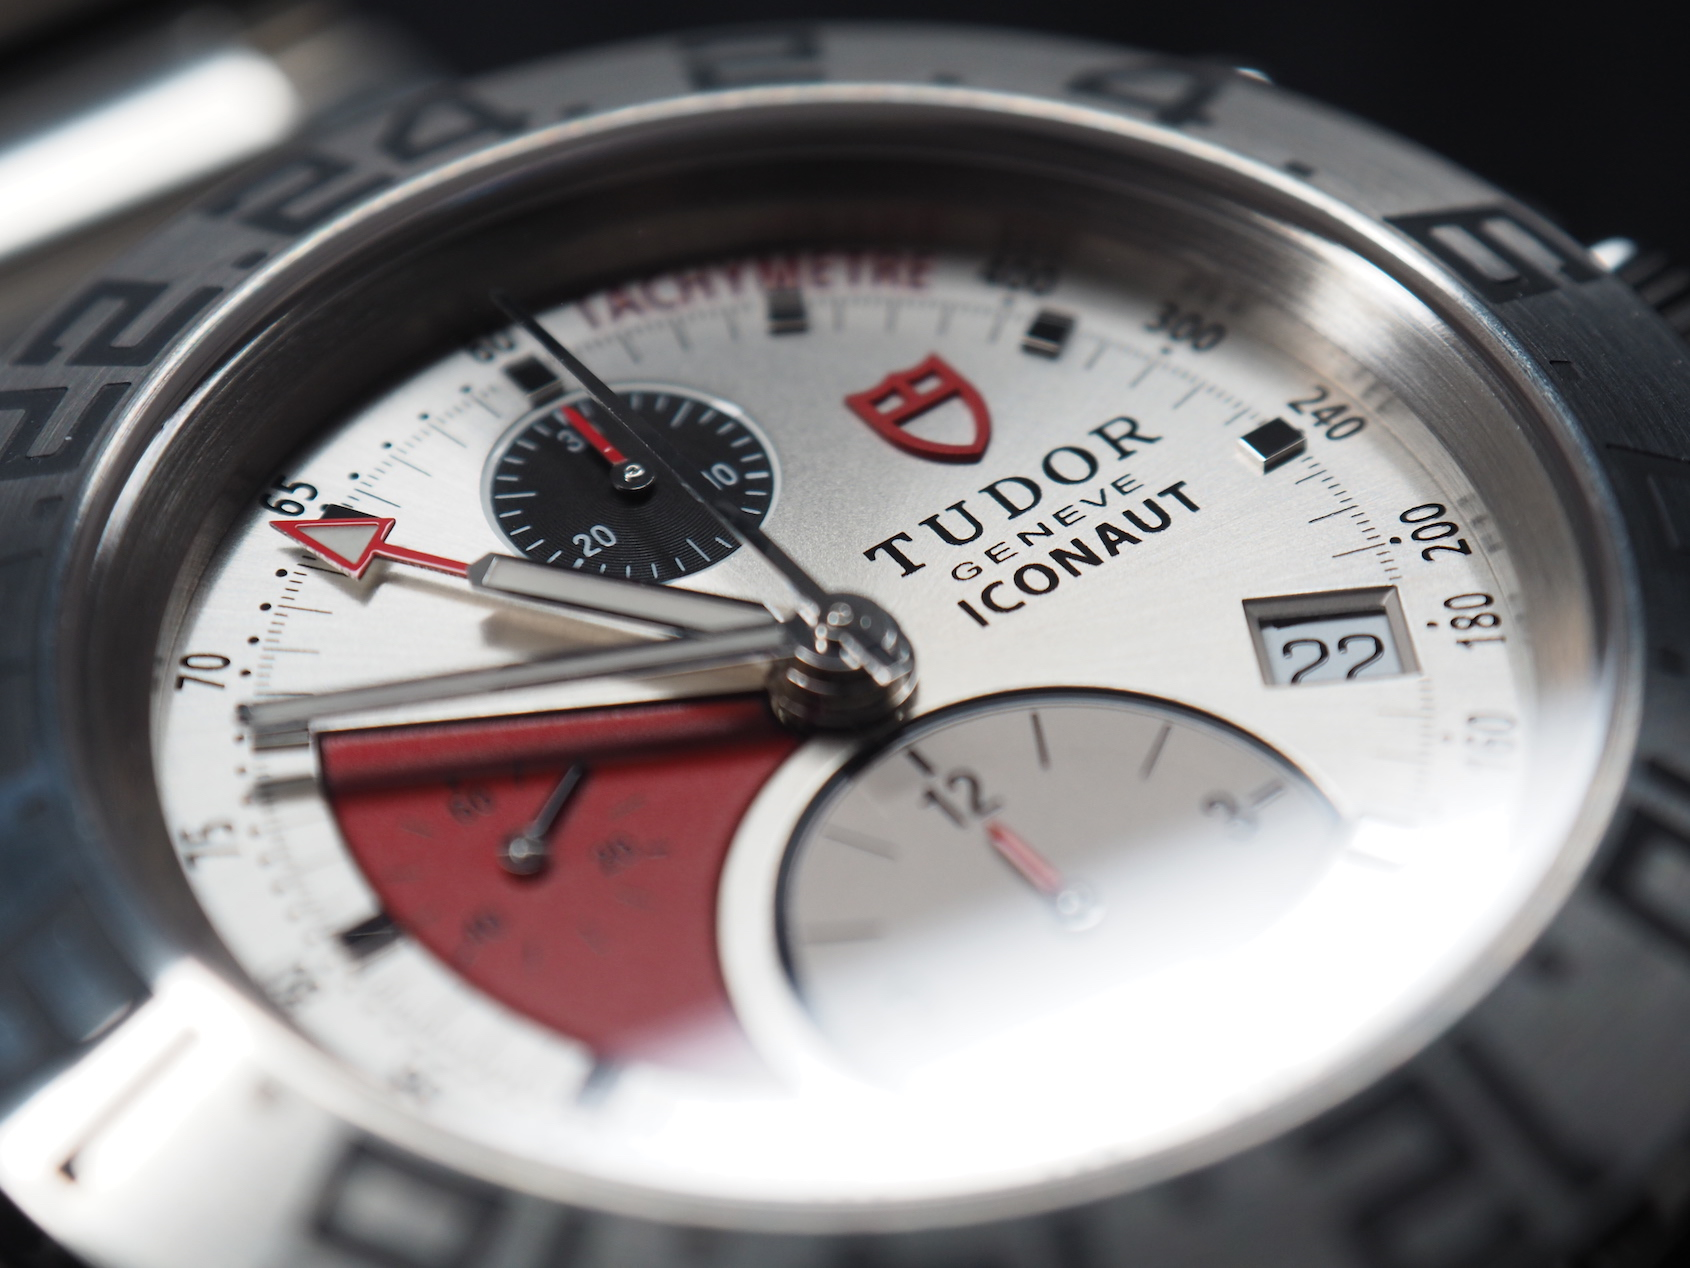 Tudor Iconaut GMT chronograph review pricing 2020